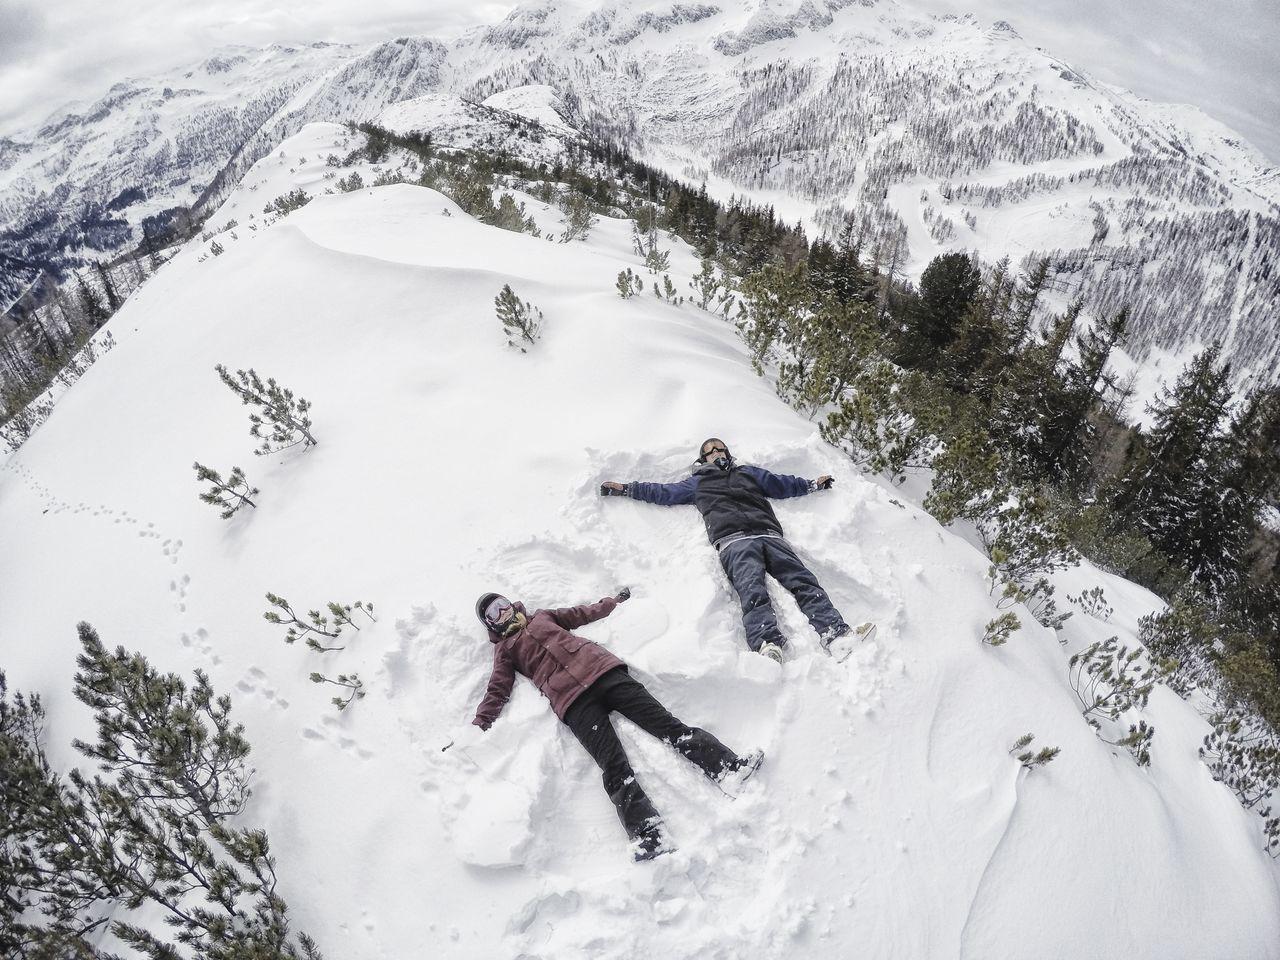 Beautiful stock photos of guten morgen, snow, winter, cold temperature, snowboarding